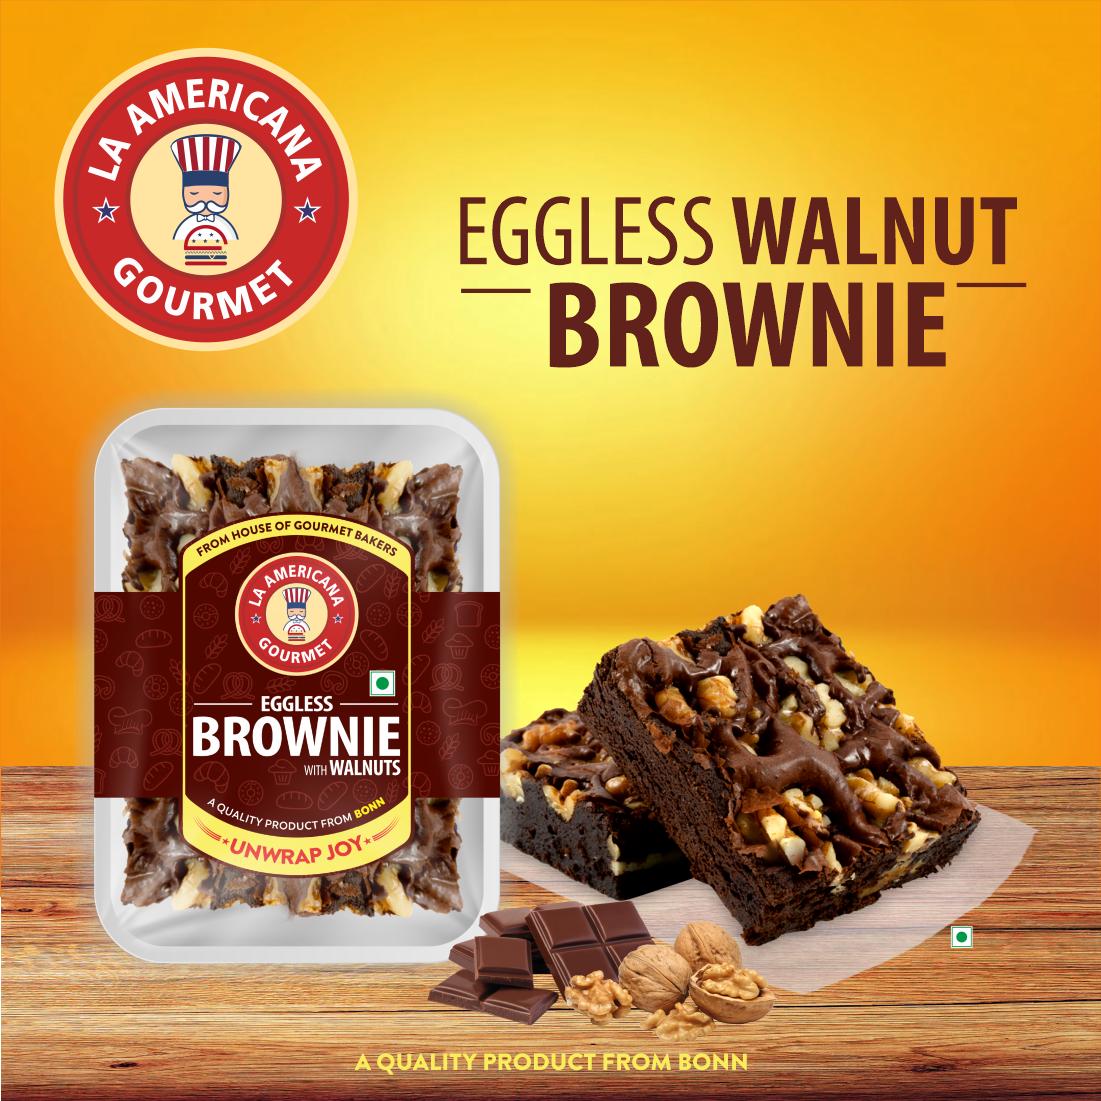 La Americana EGGLESS WALNUT BROWNIE 70 g